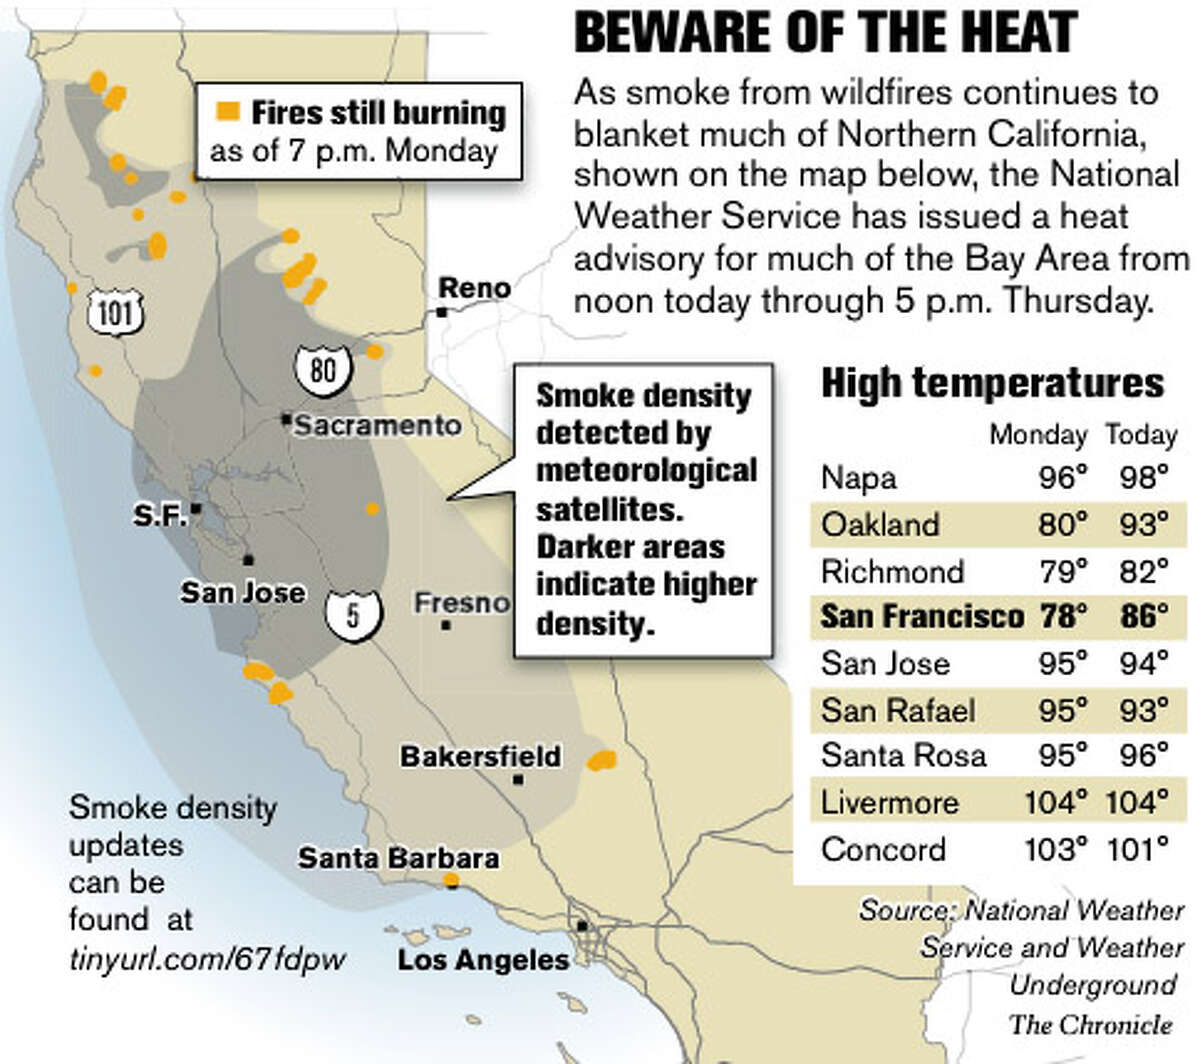 Beware of the Heat. Chronicle Graphic